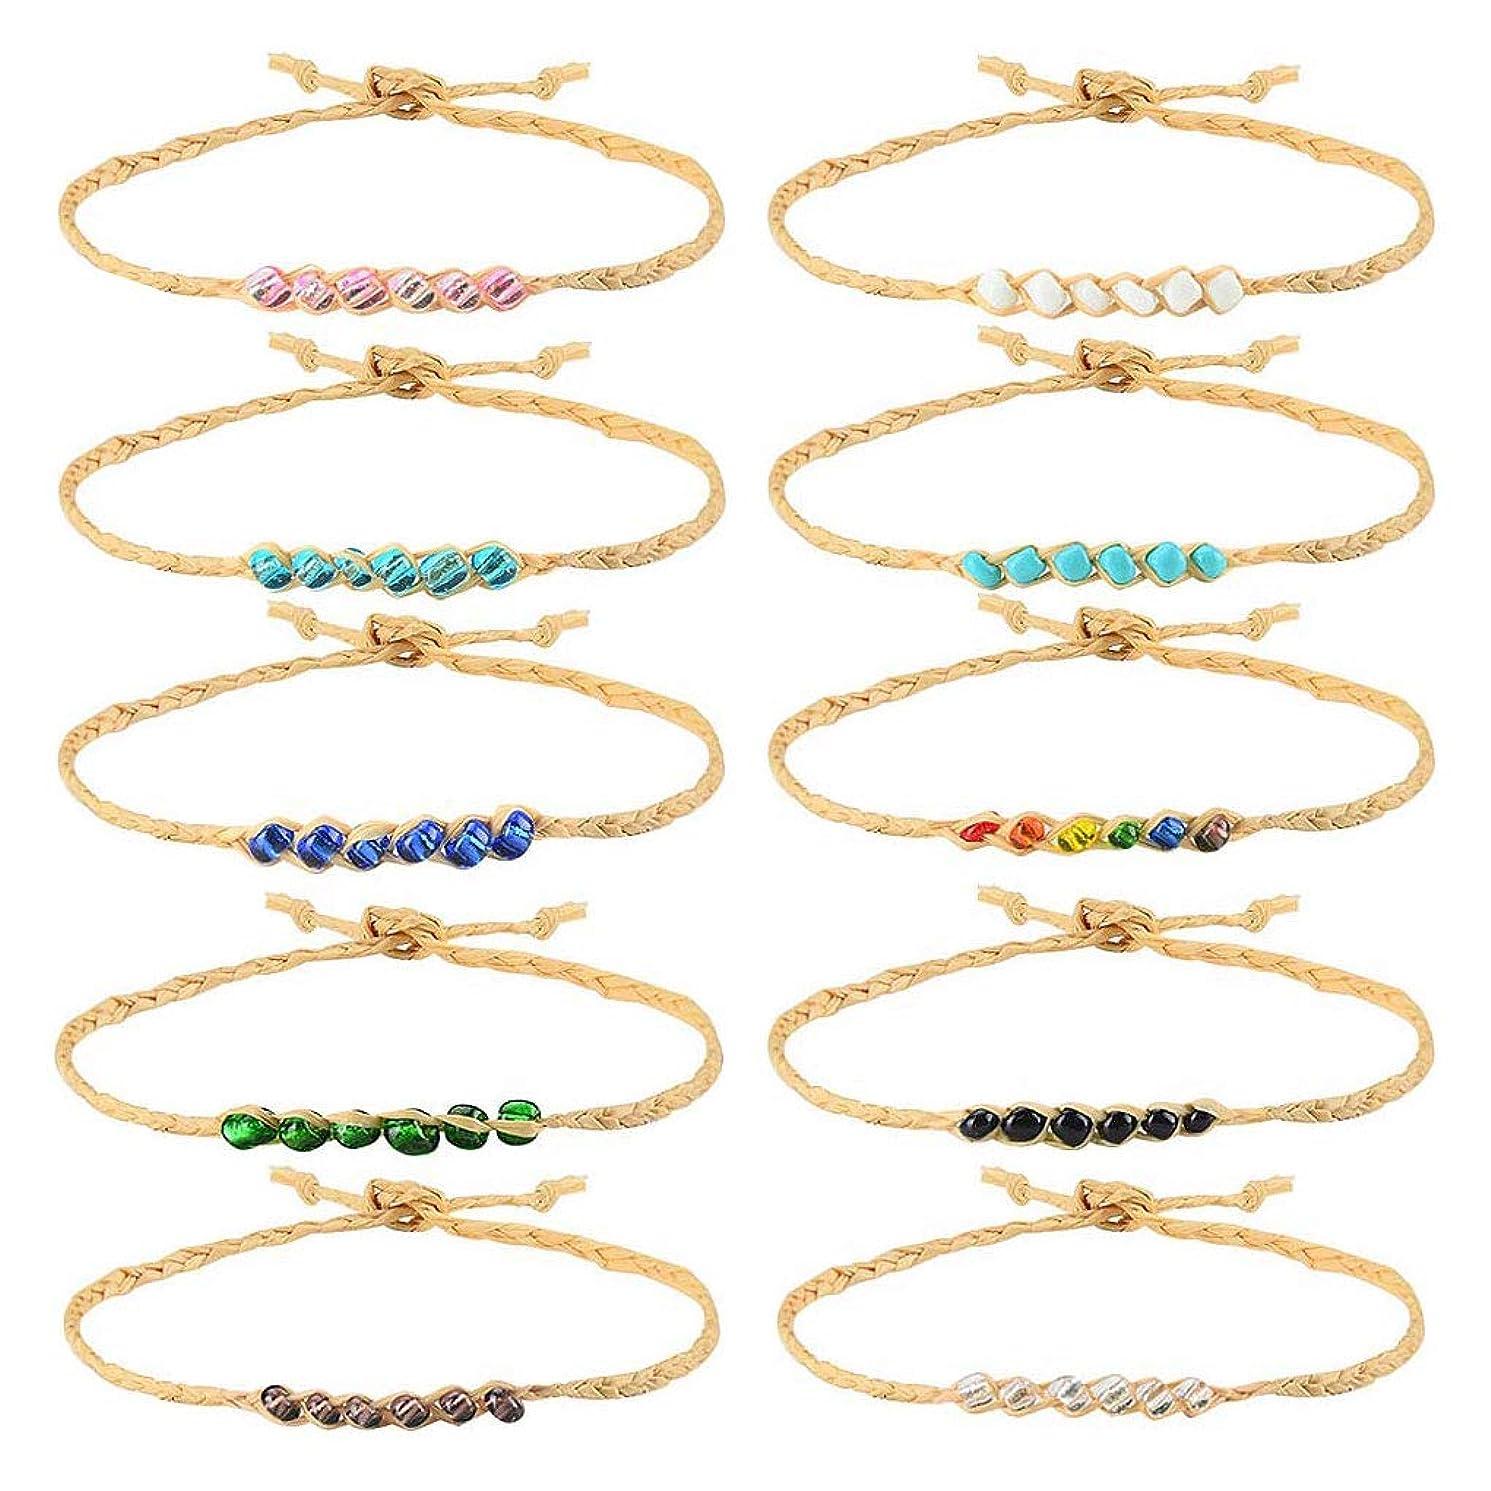 Tarsus 100% Waterproof Beaded Hemp Wish Friendship Bracelets/Anklets Set for Women Girls String Handmade Bracelets Braided Woven Adjustable Jewelry Birthday Gift 10 Pcs